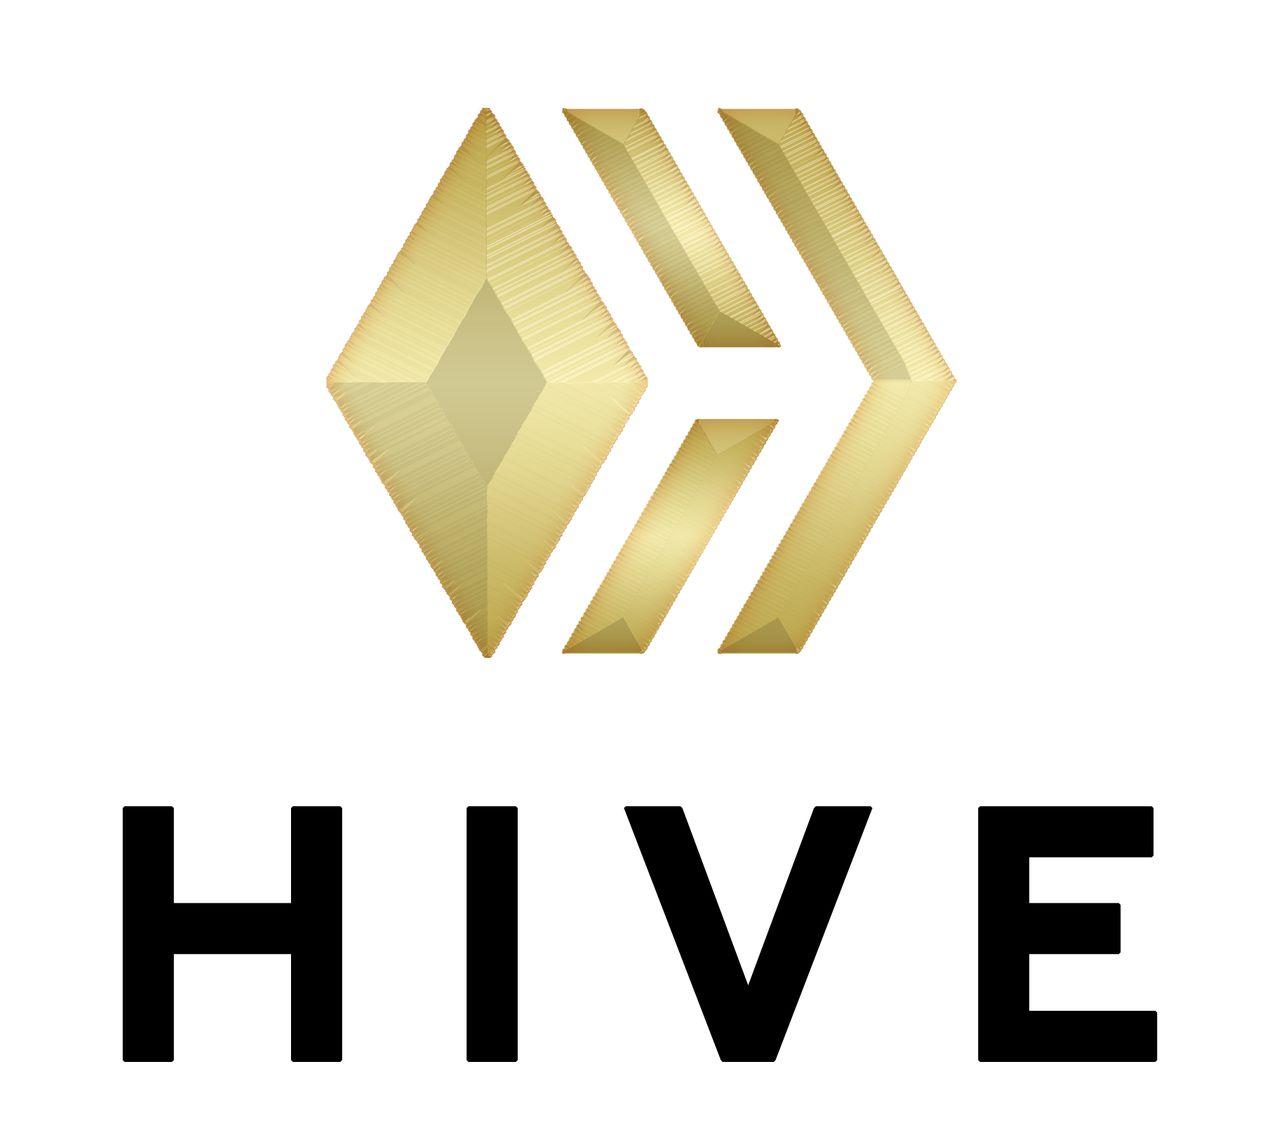 Hive gold diamond by HB.jpg